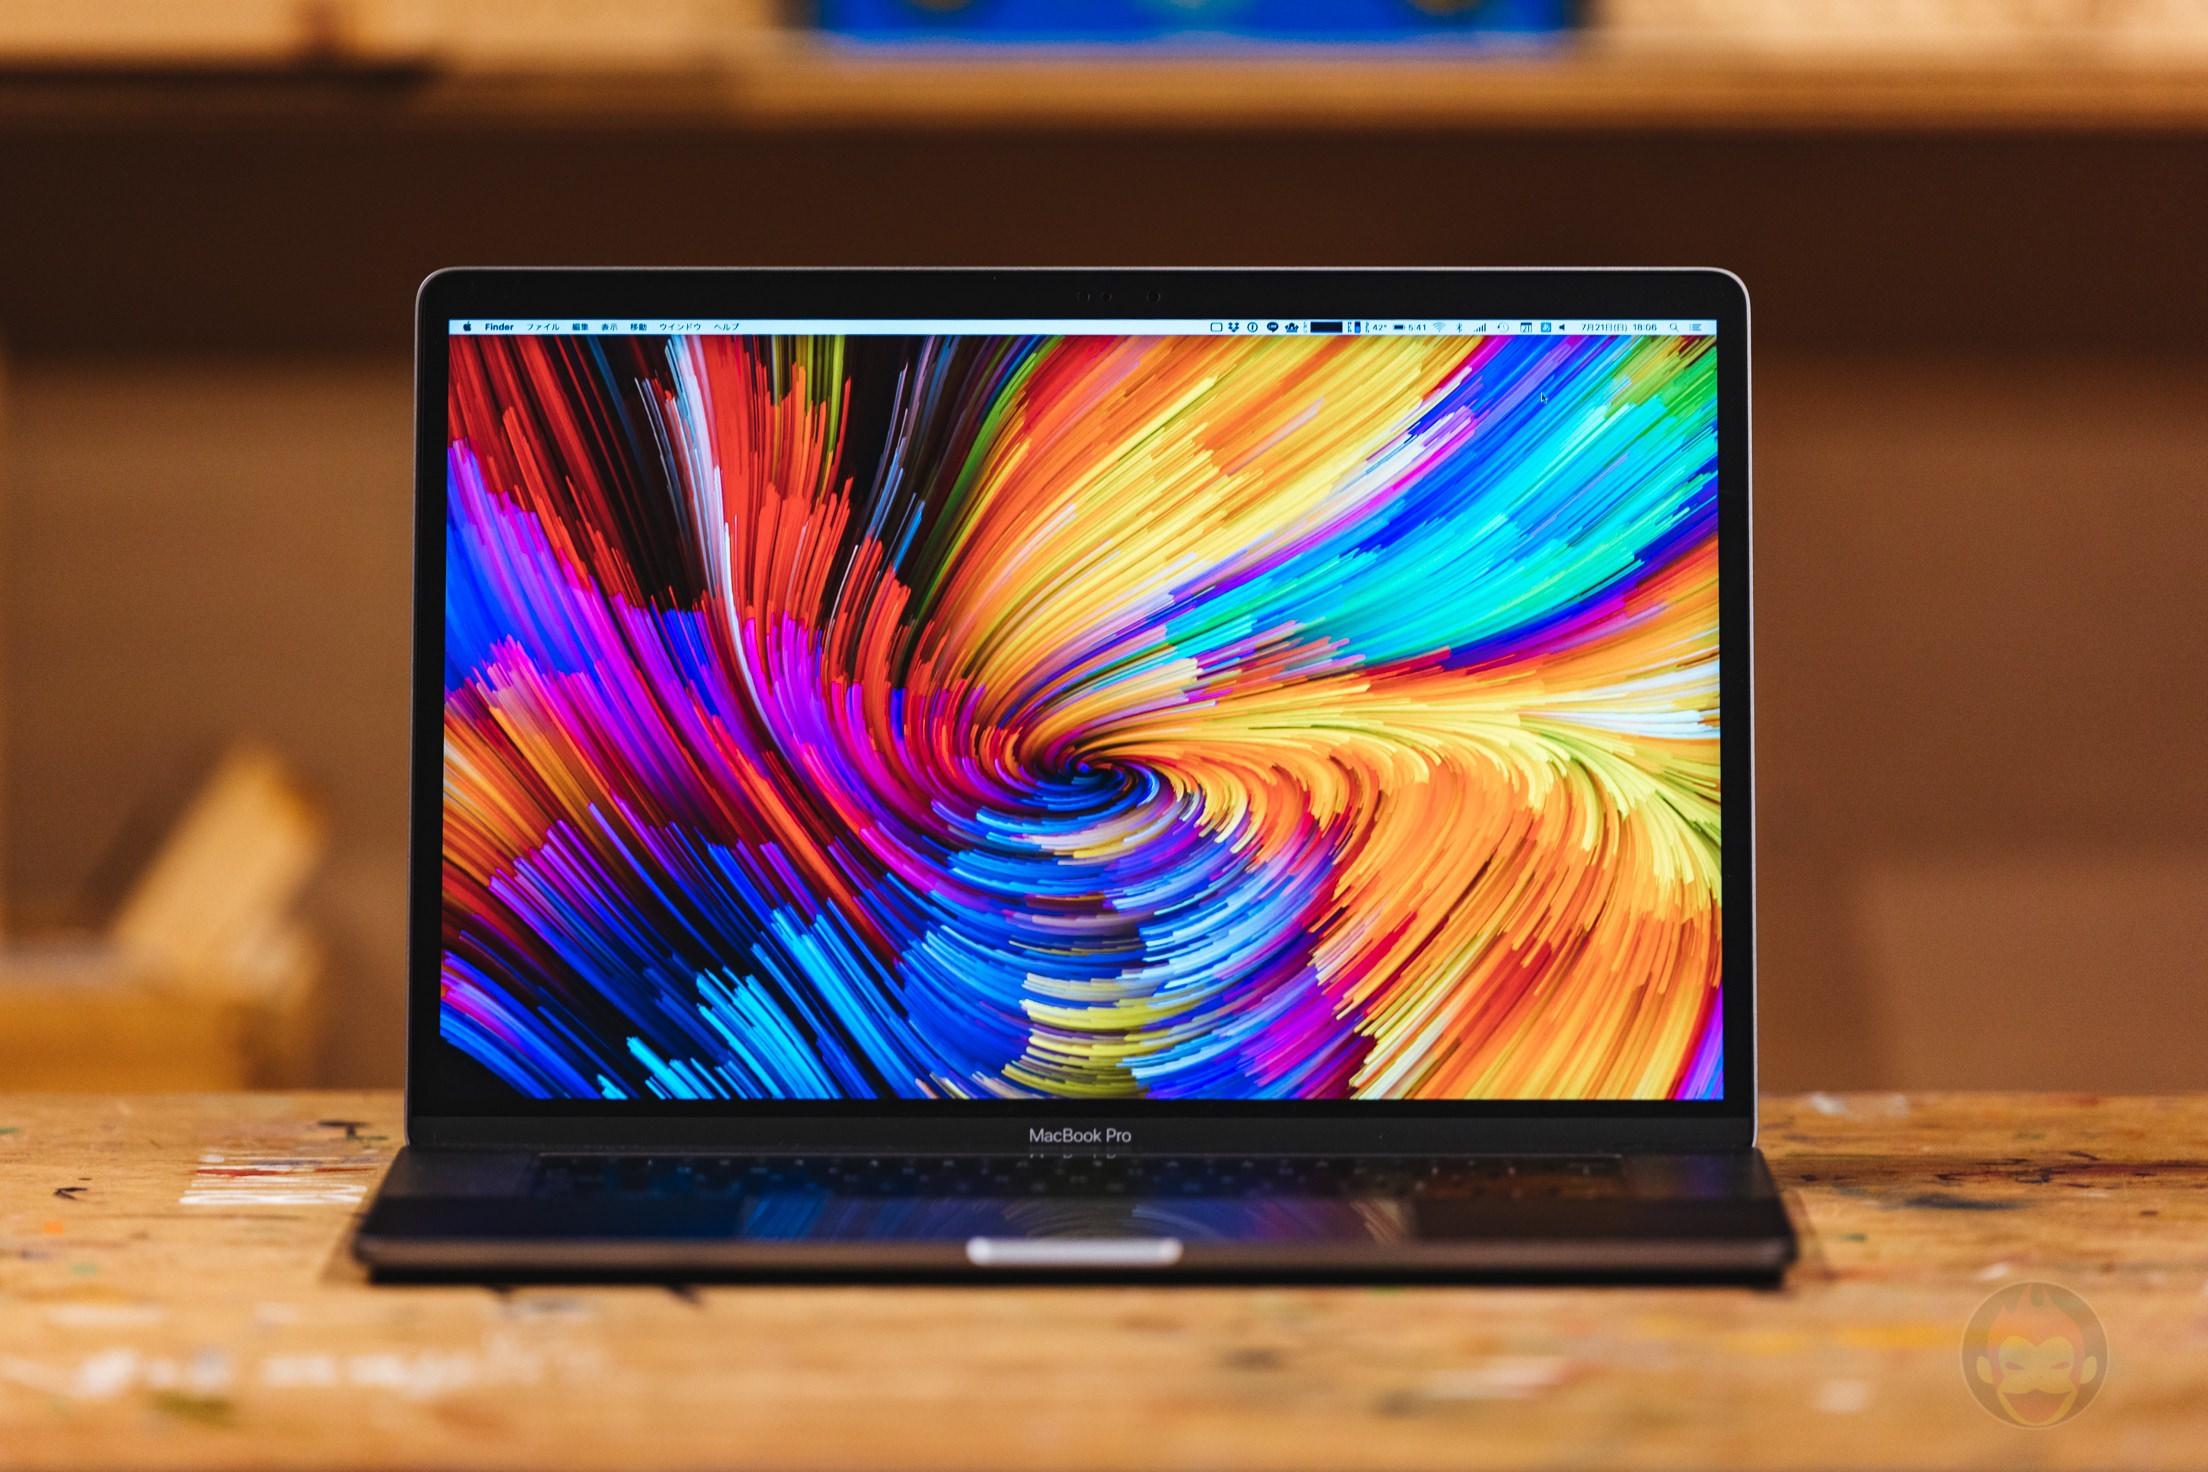 MacBook-Pro-2019-15inch-review-21.jpg